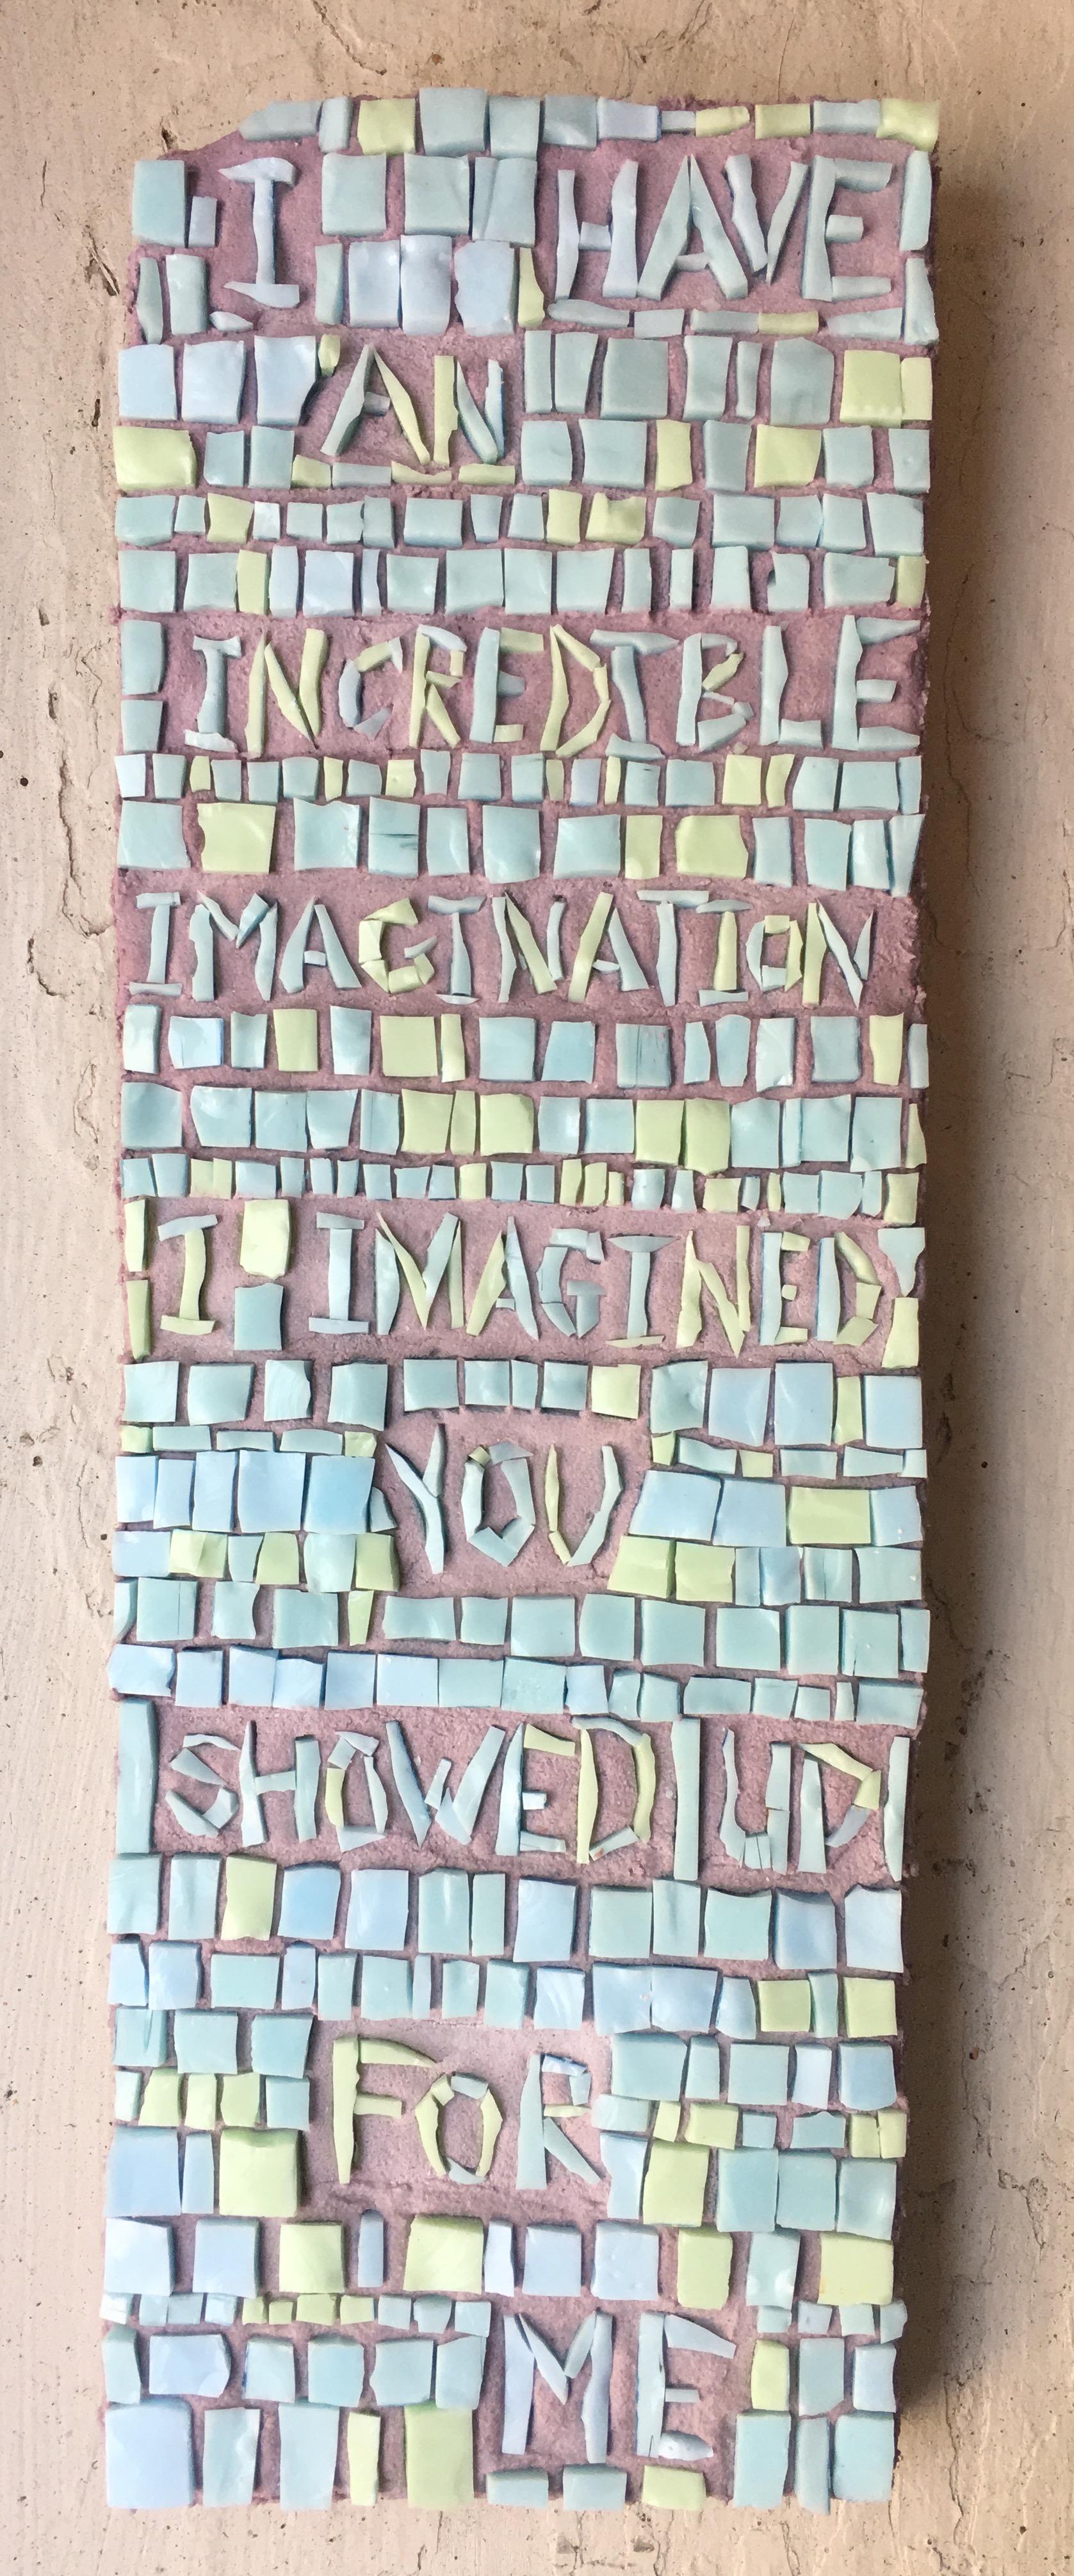 Mosaic Poem 3 (imagination)